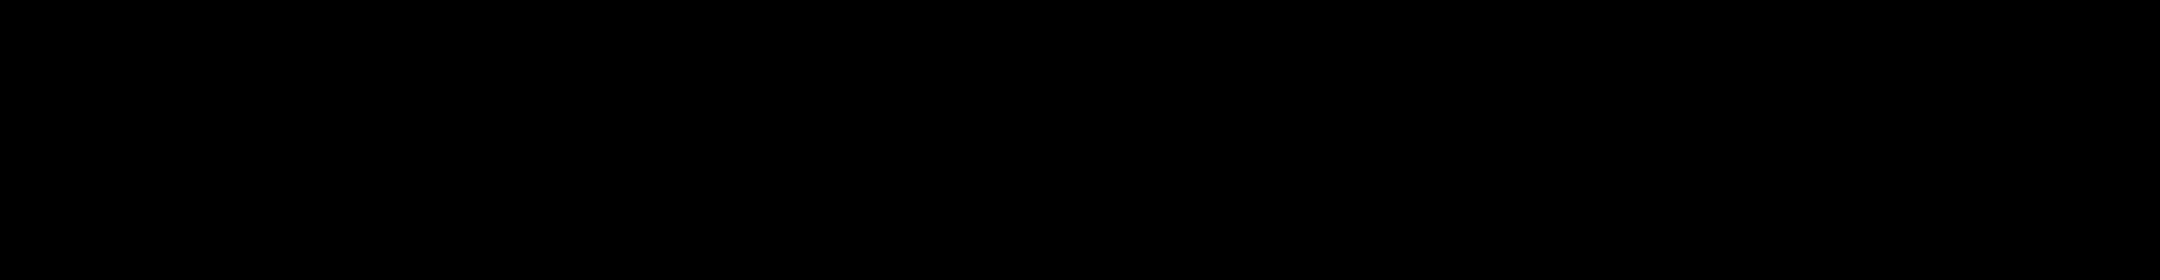 sephora logo 1 - Sephora Logo